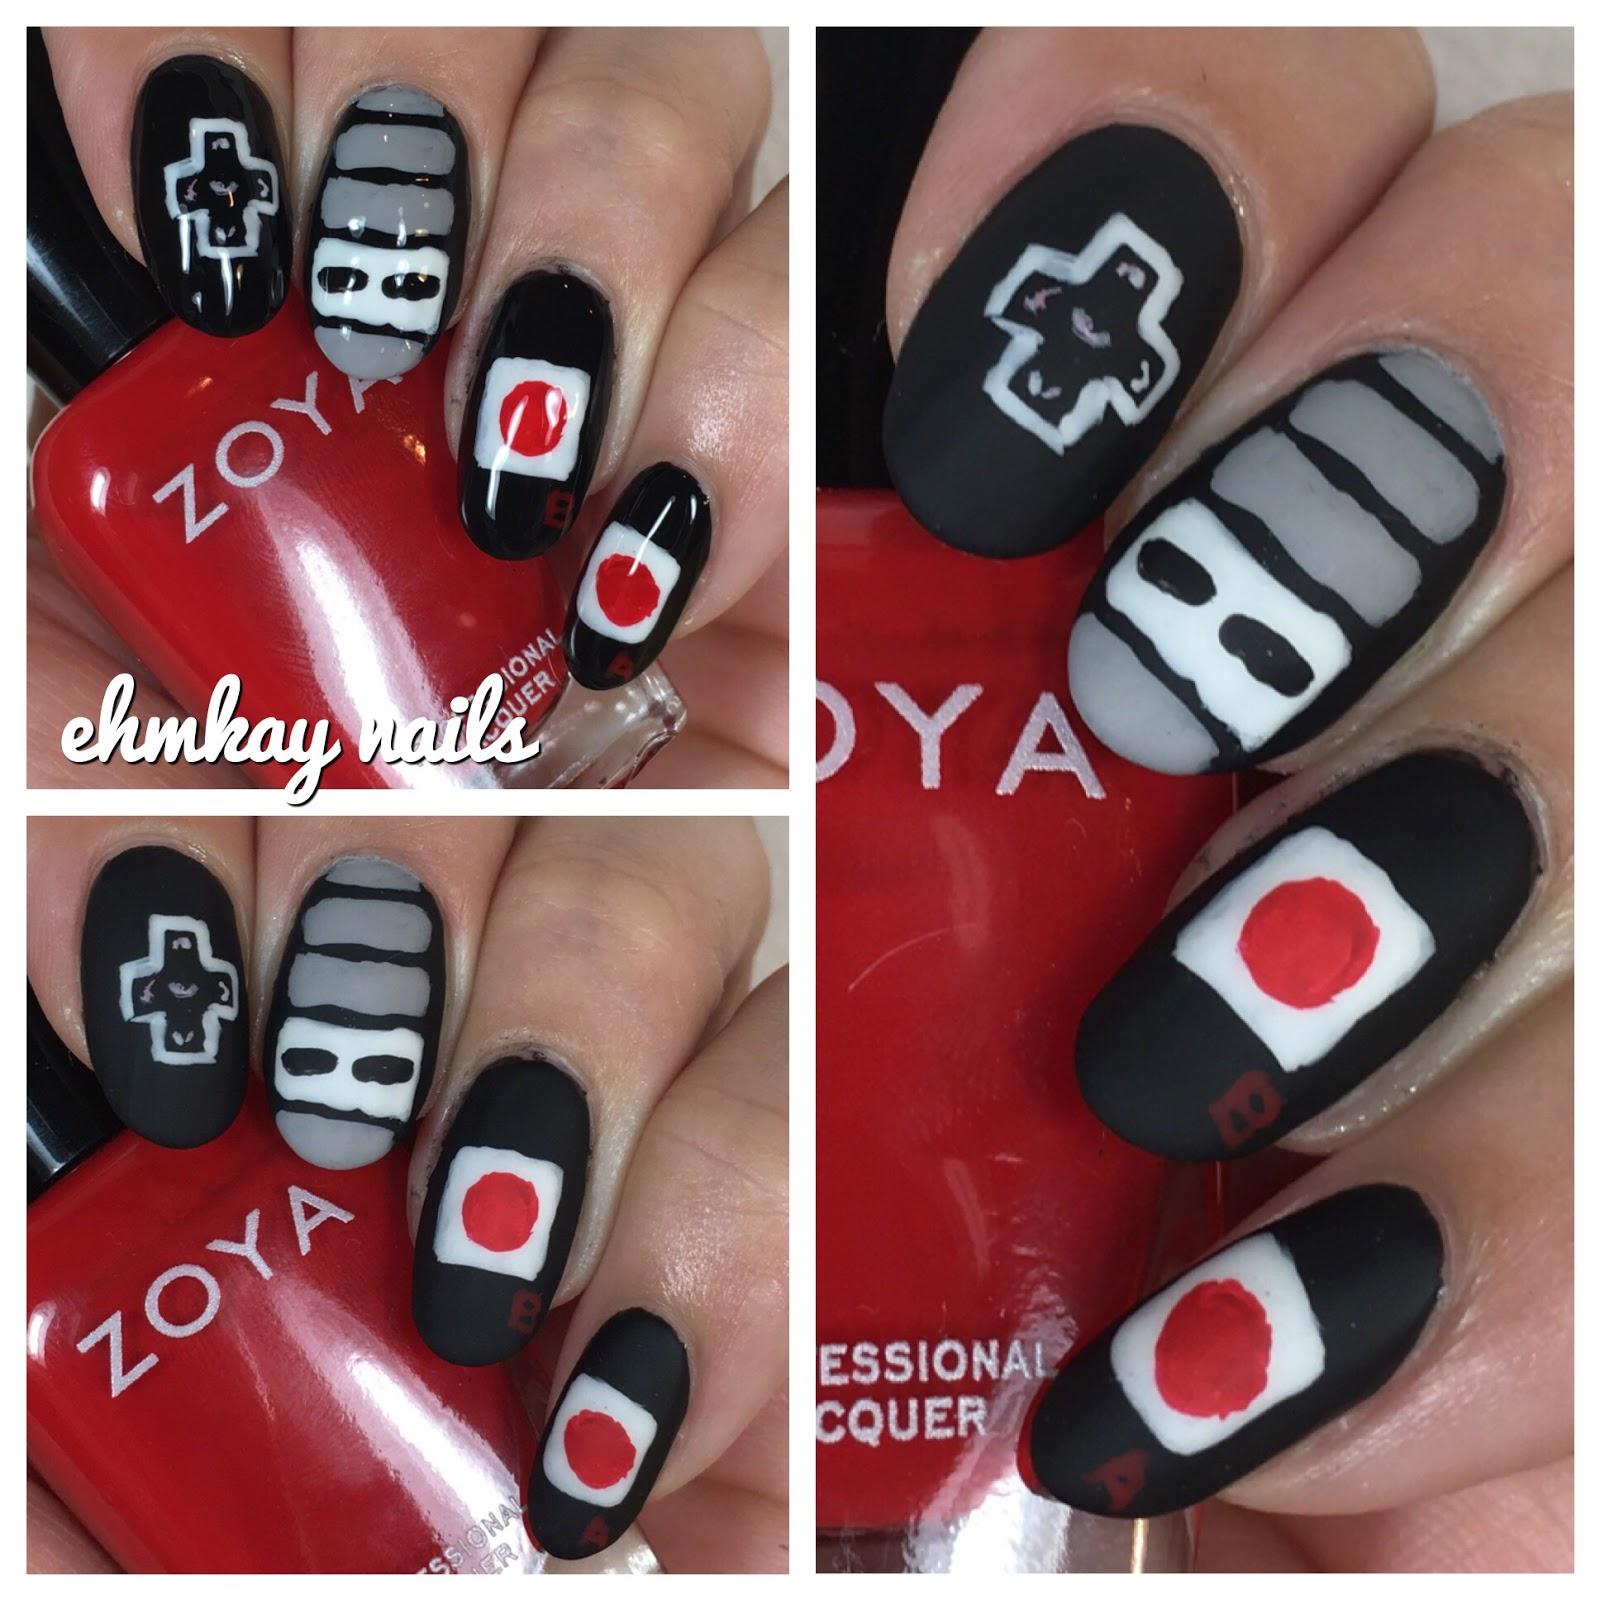 ehmkay nails: 80s Nail Art: Original Nintendo Controller Nail Art